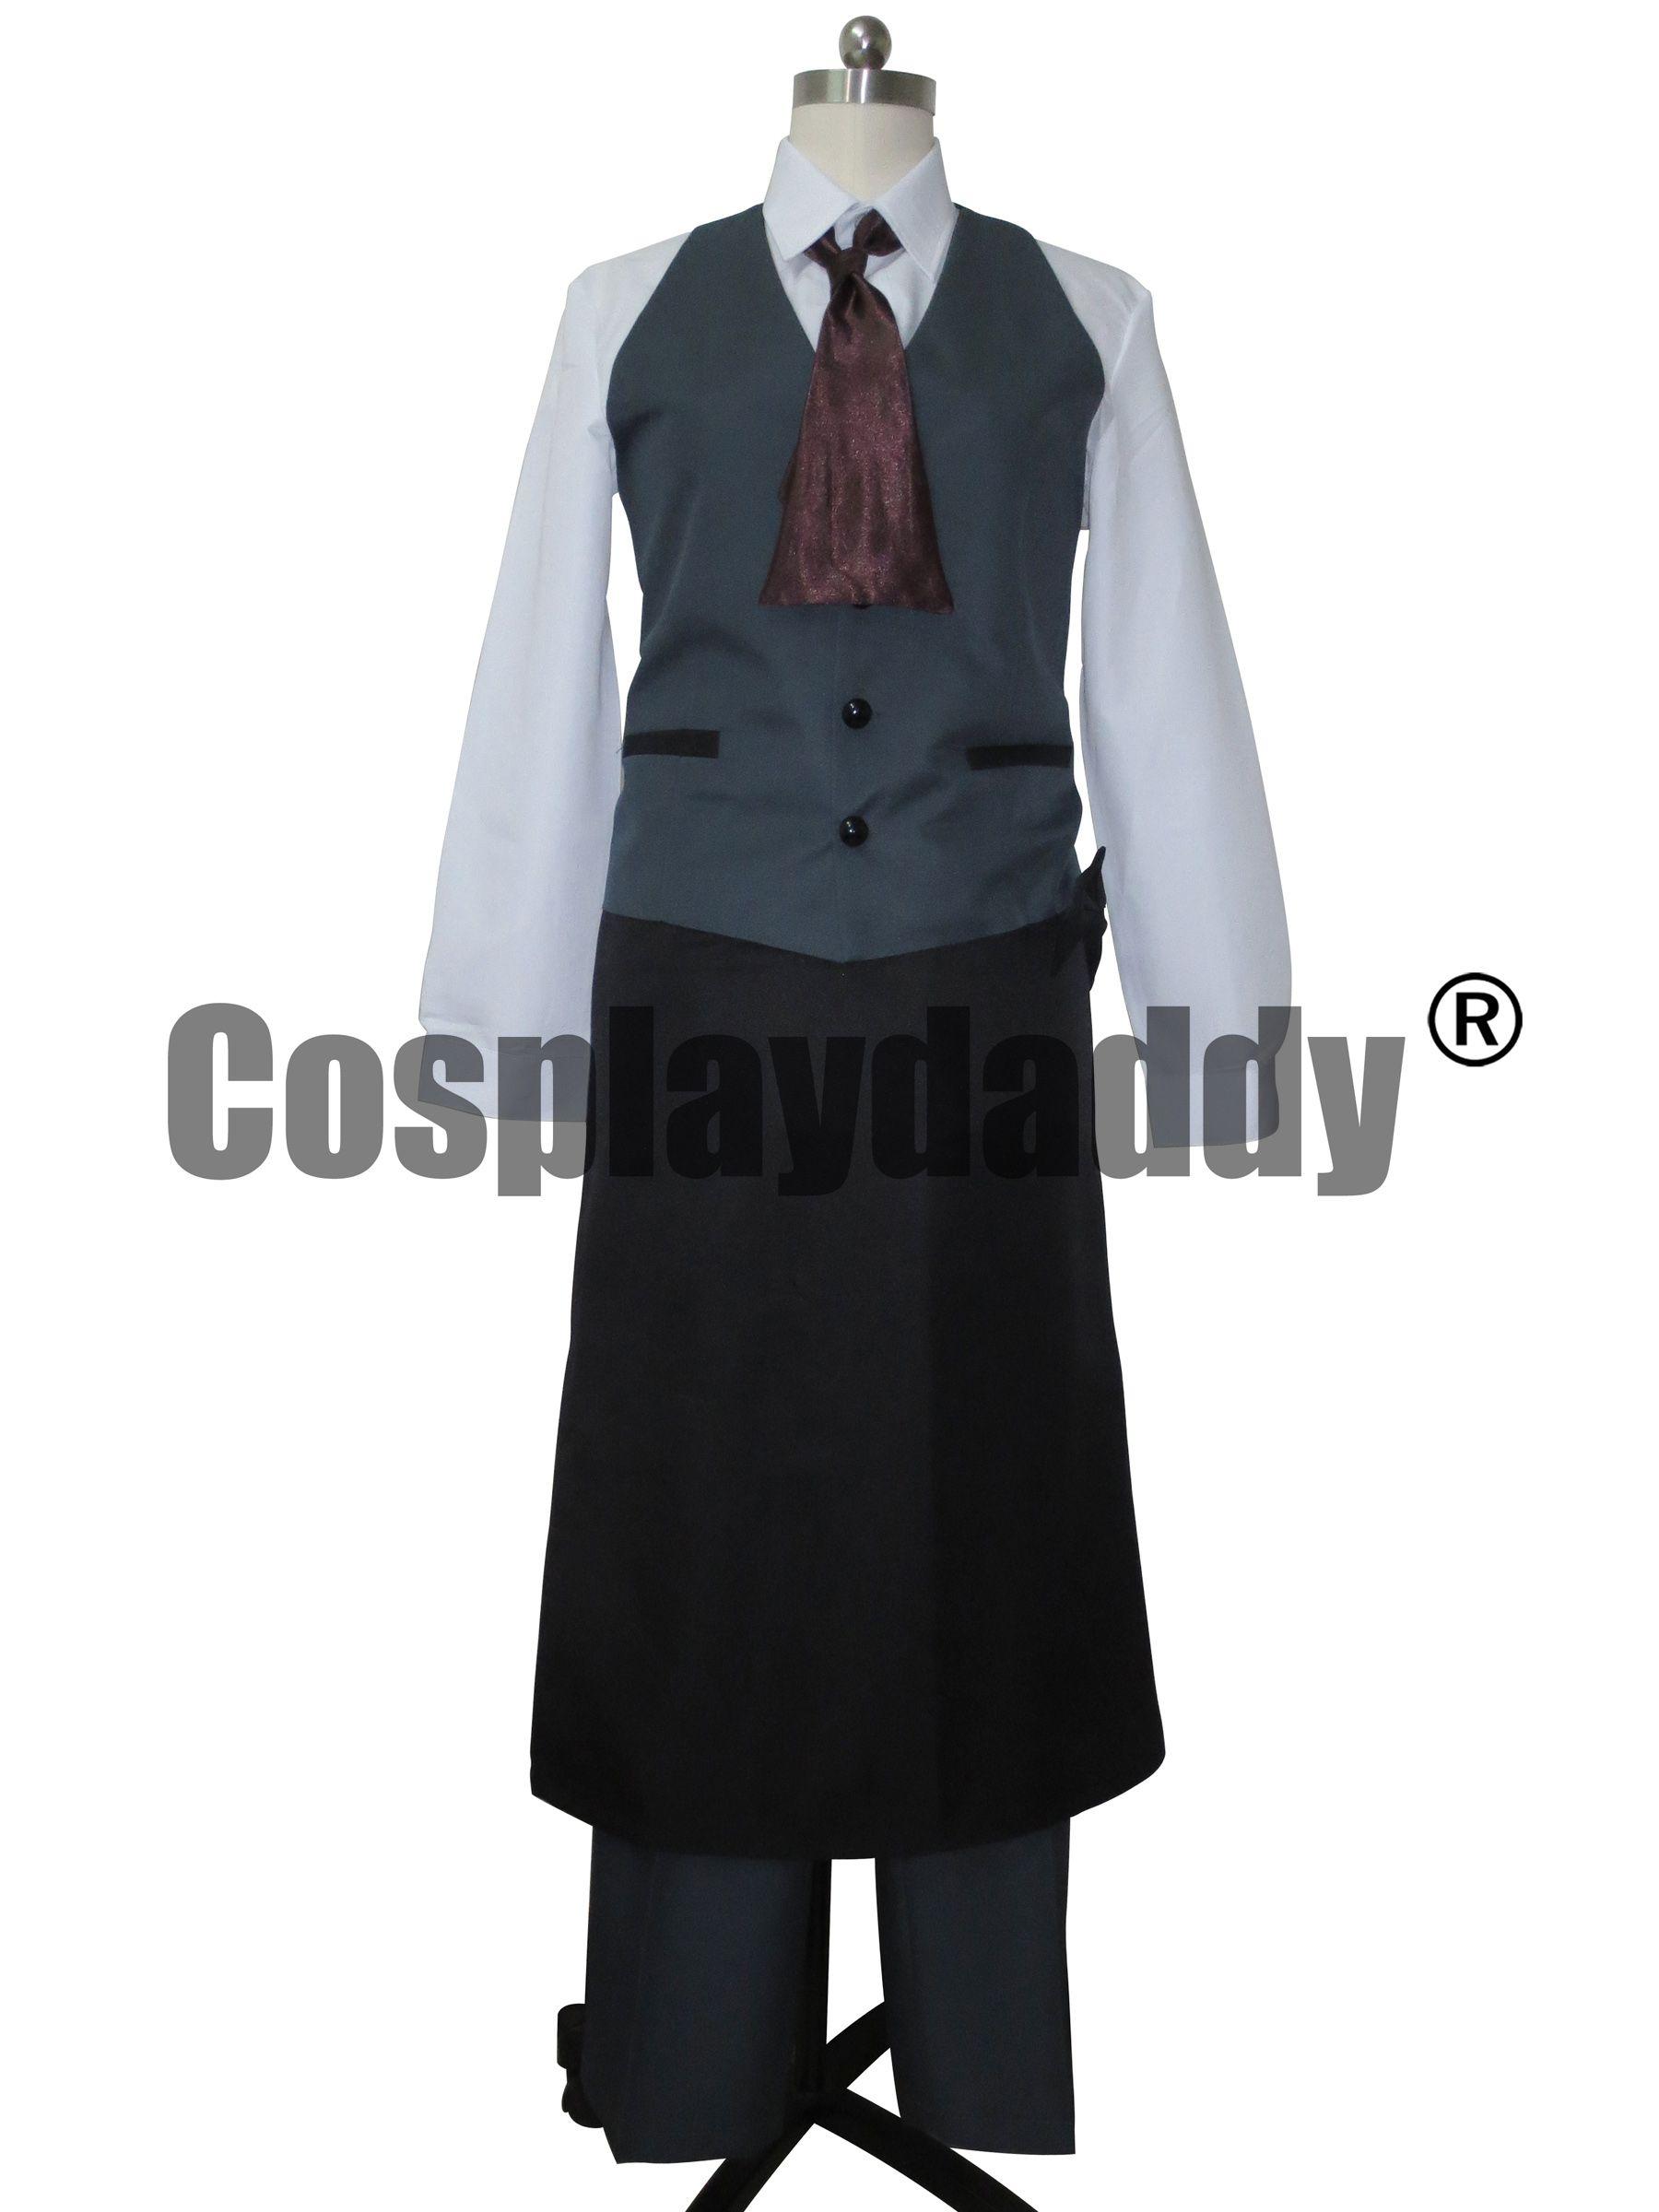 Tokyo Ghoul Ken Kaneki Uniform Cosplay Kostüm für Kaffeehaus Kellner angepasst